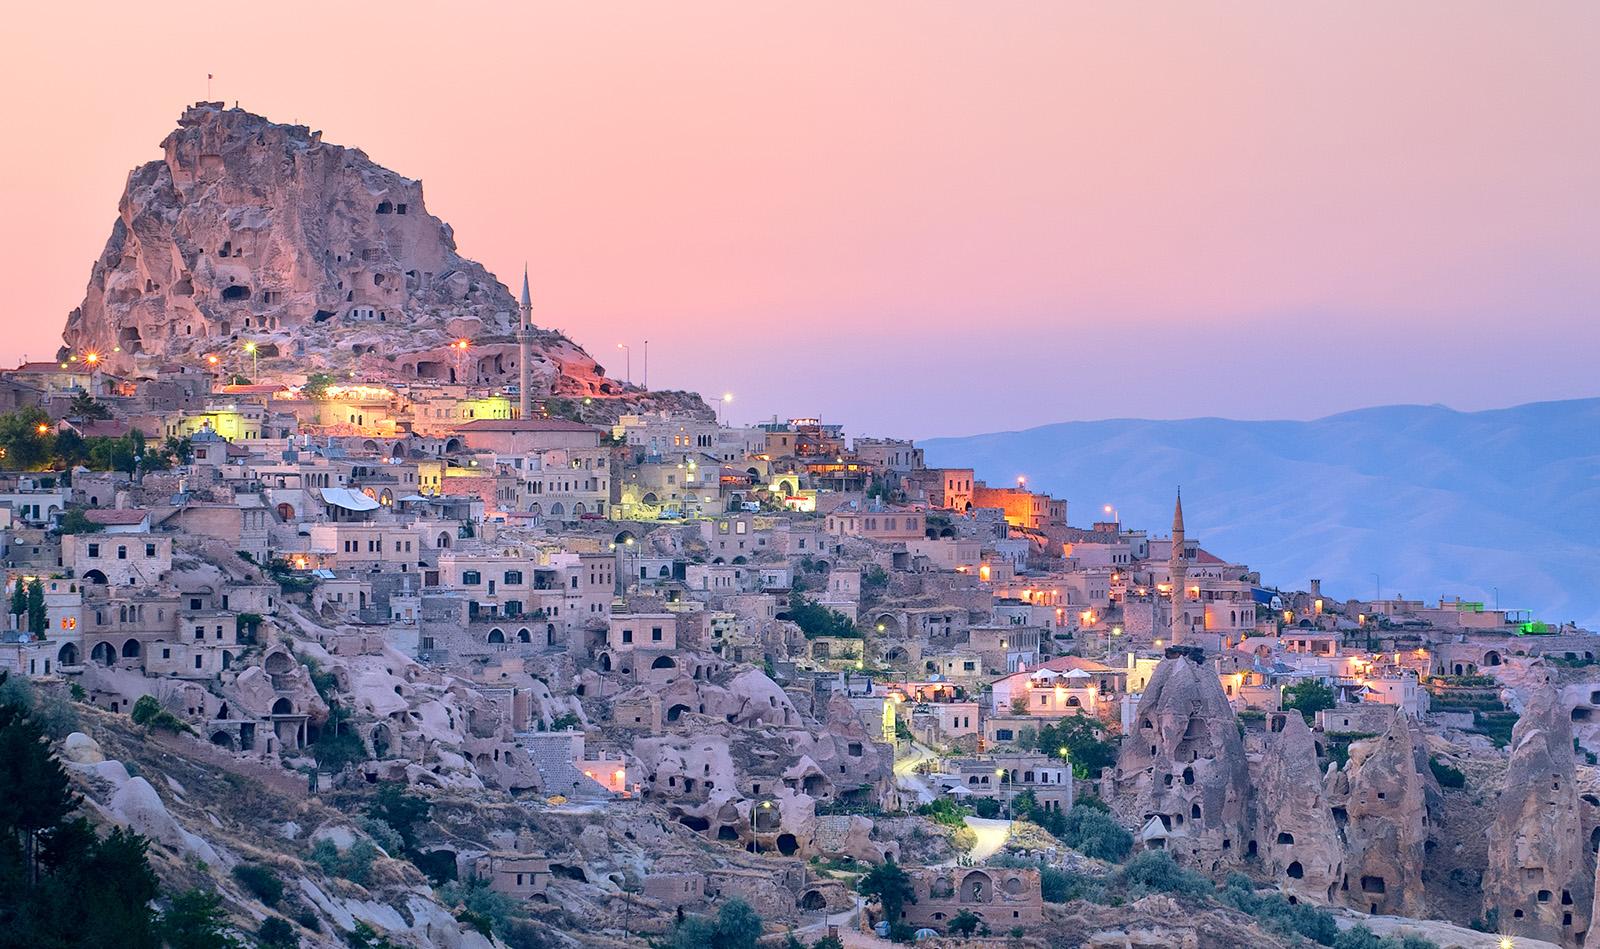 Berpetualang di Cappadocia, dari Kota Bawah Tanah hingga Melayang di Langit Turki